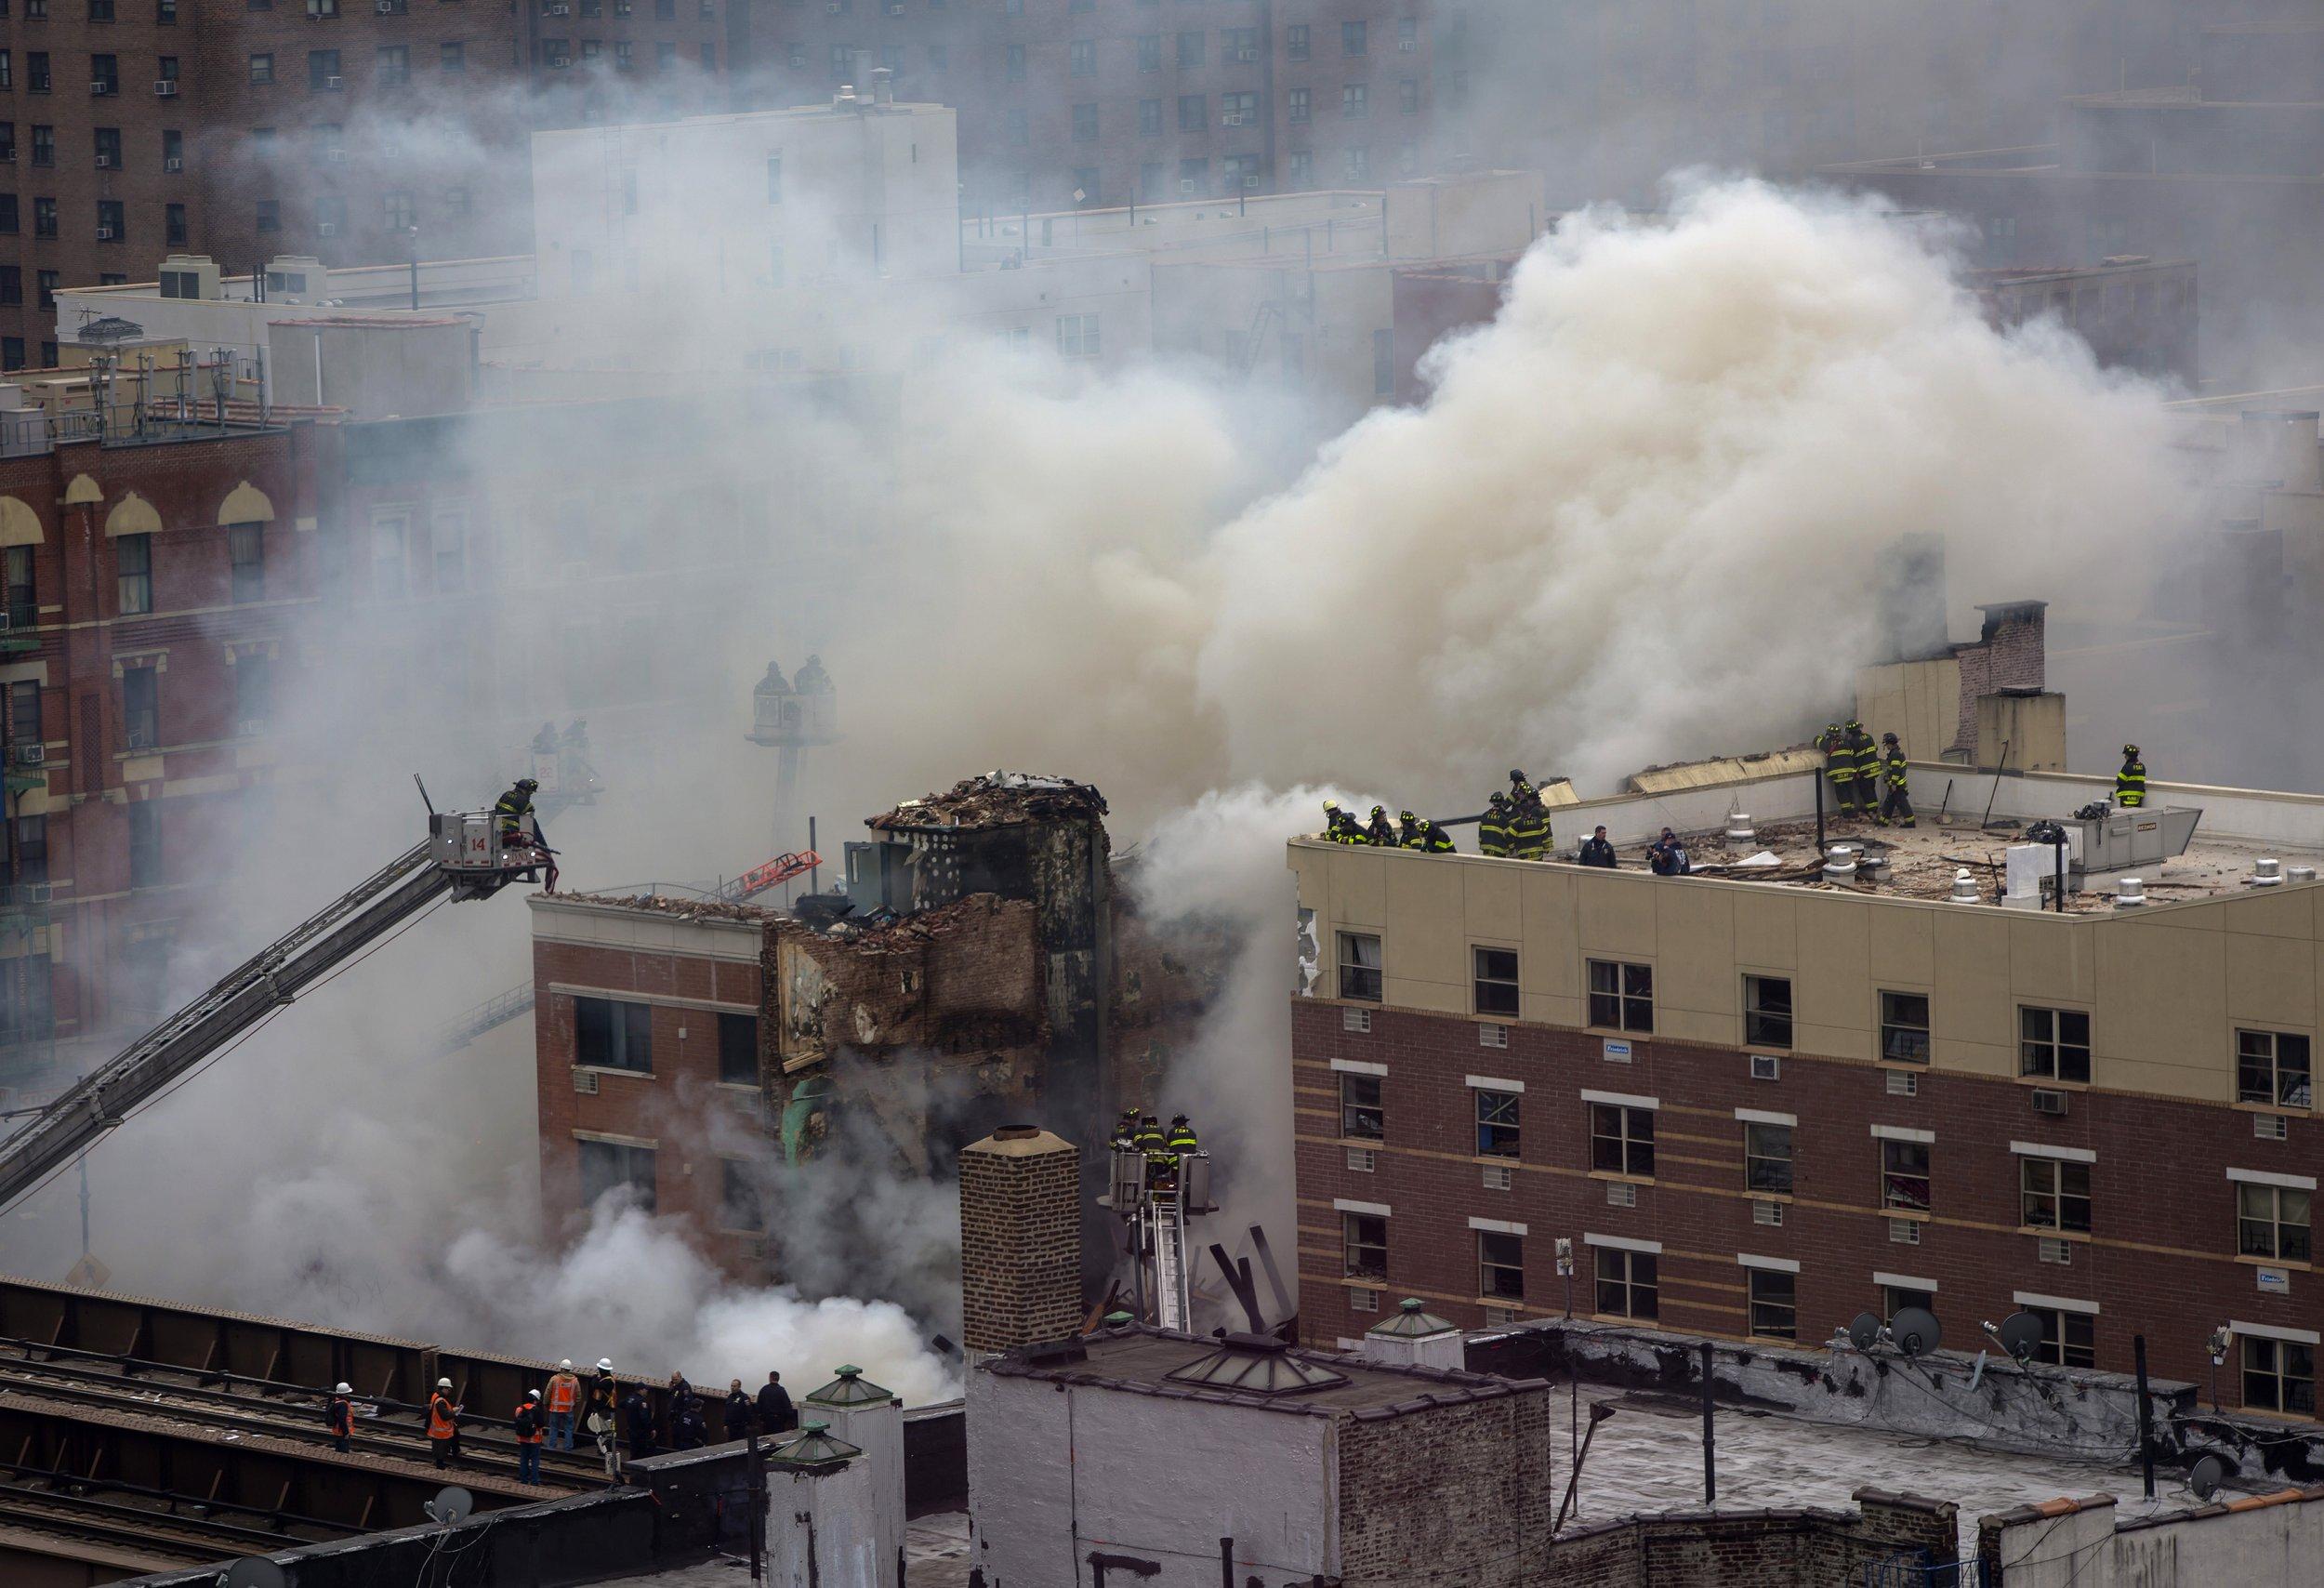 Harlem explosion 2